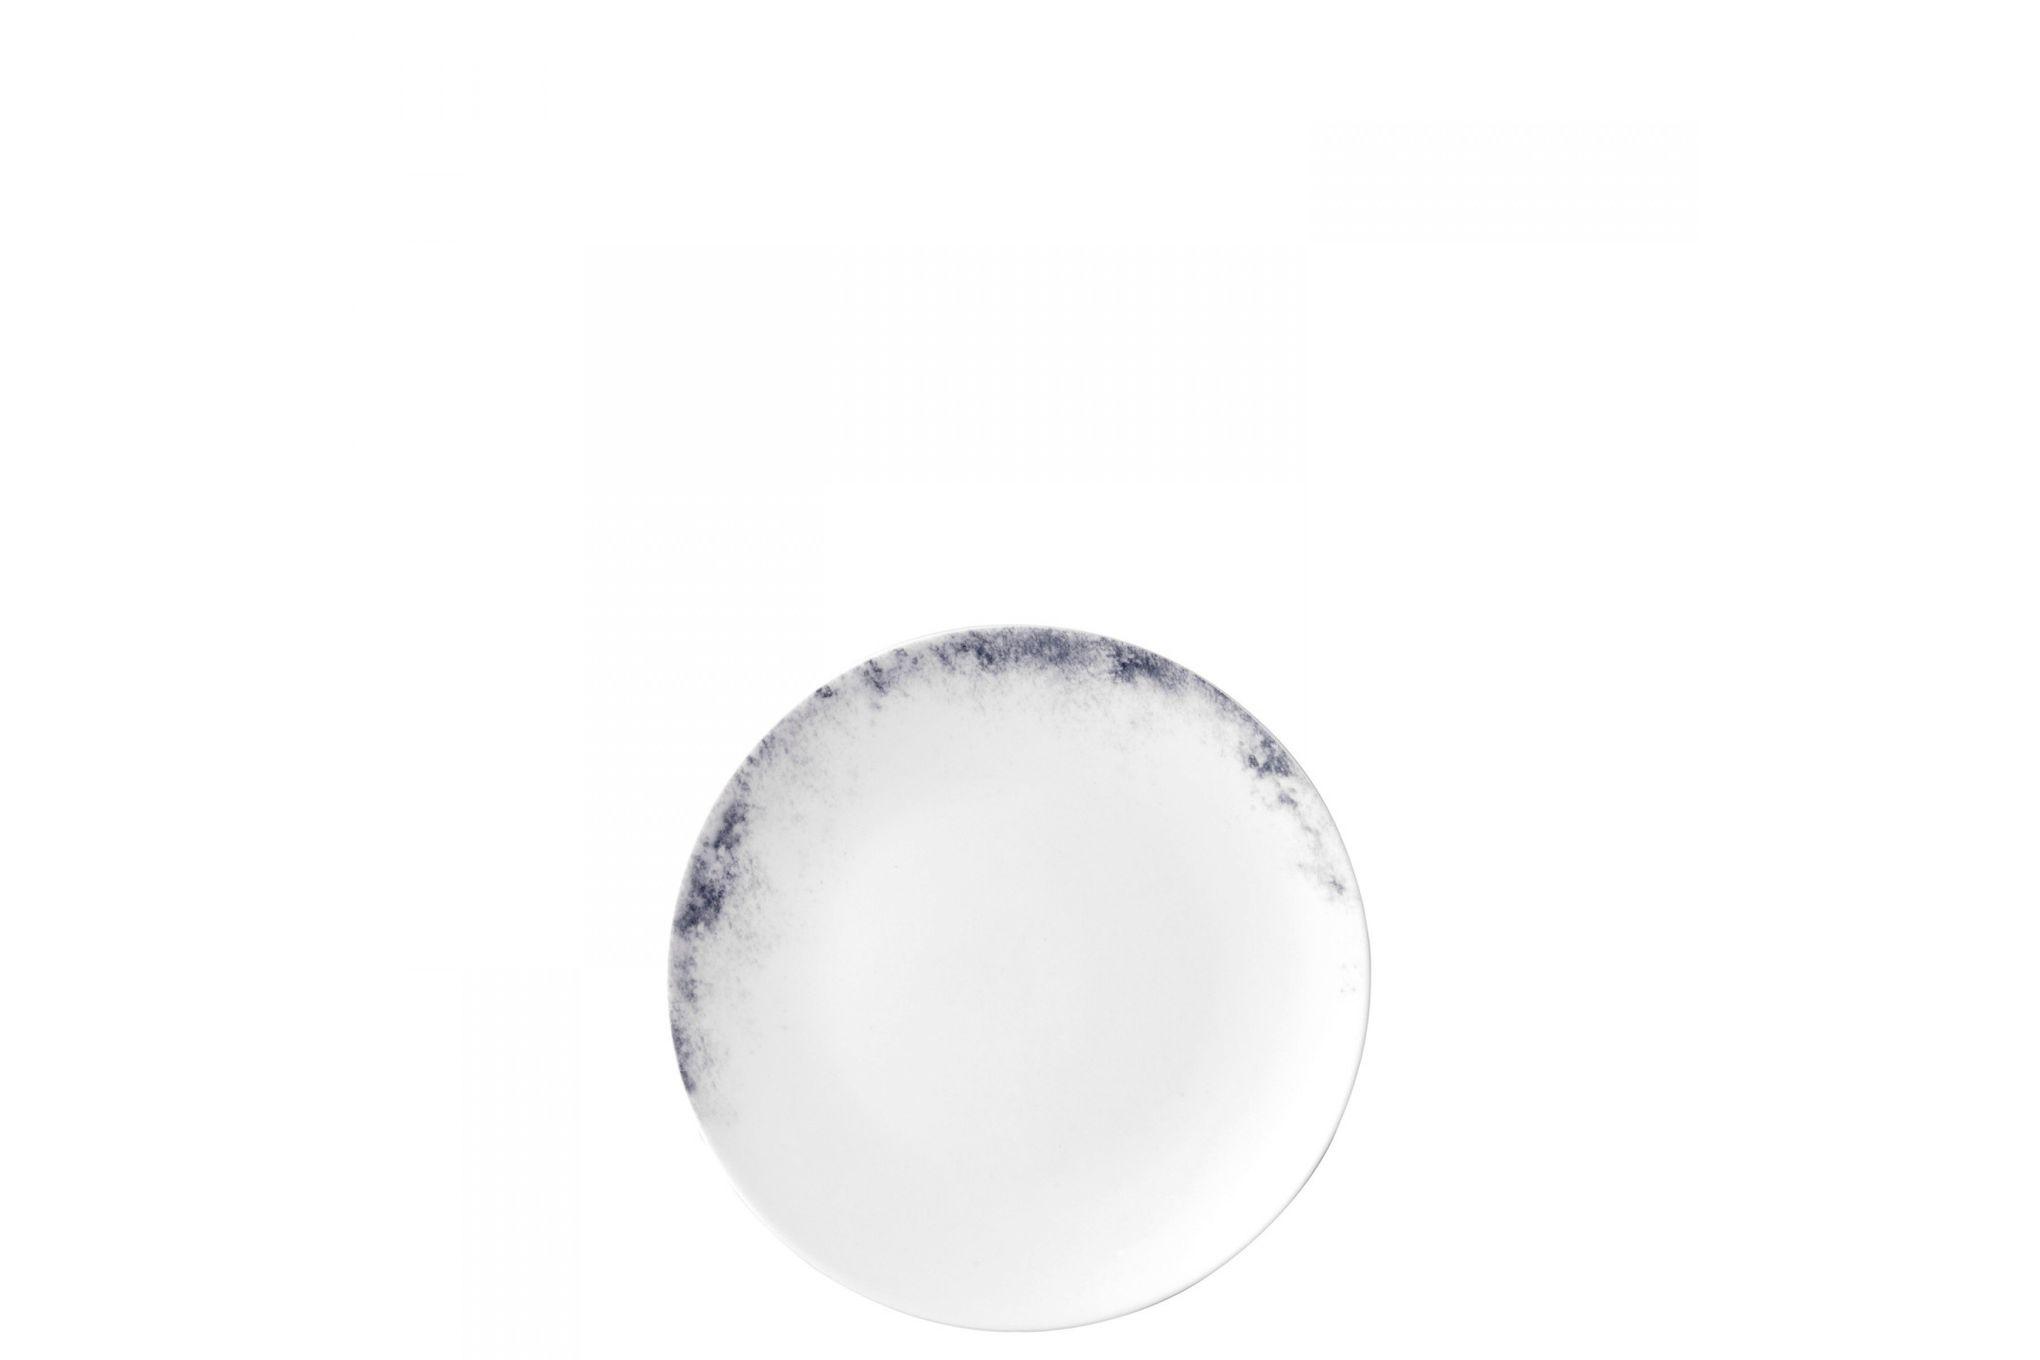 Vera Wang for Wedgwood Pointilliste Tea Plate 15cm thumb 1